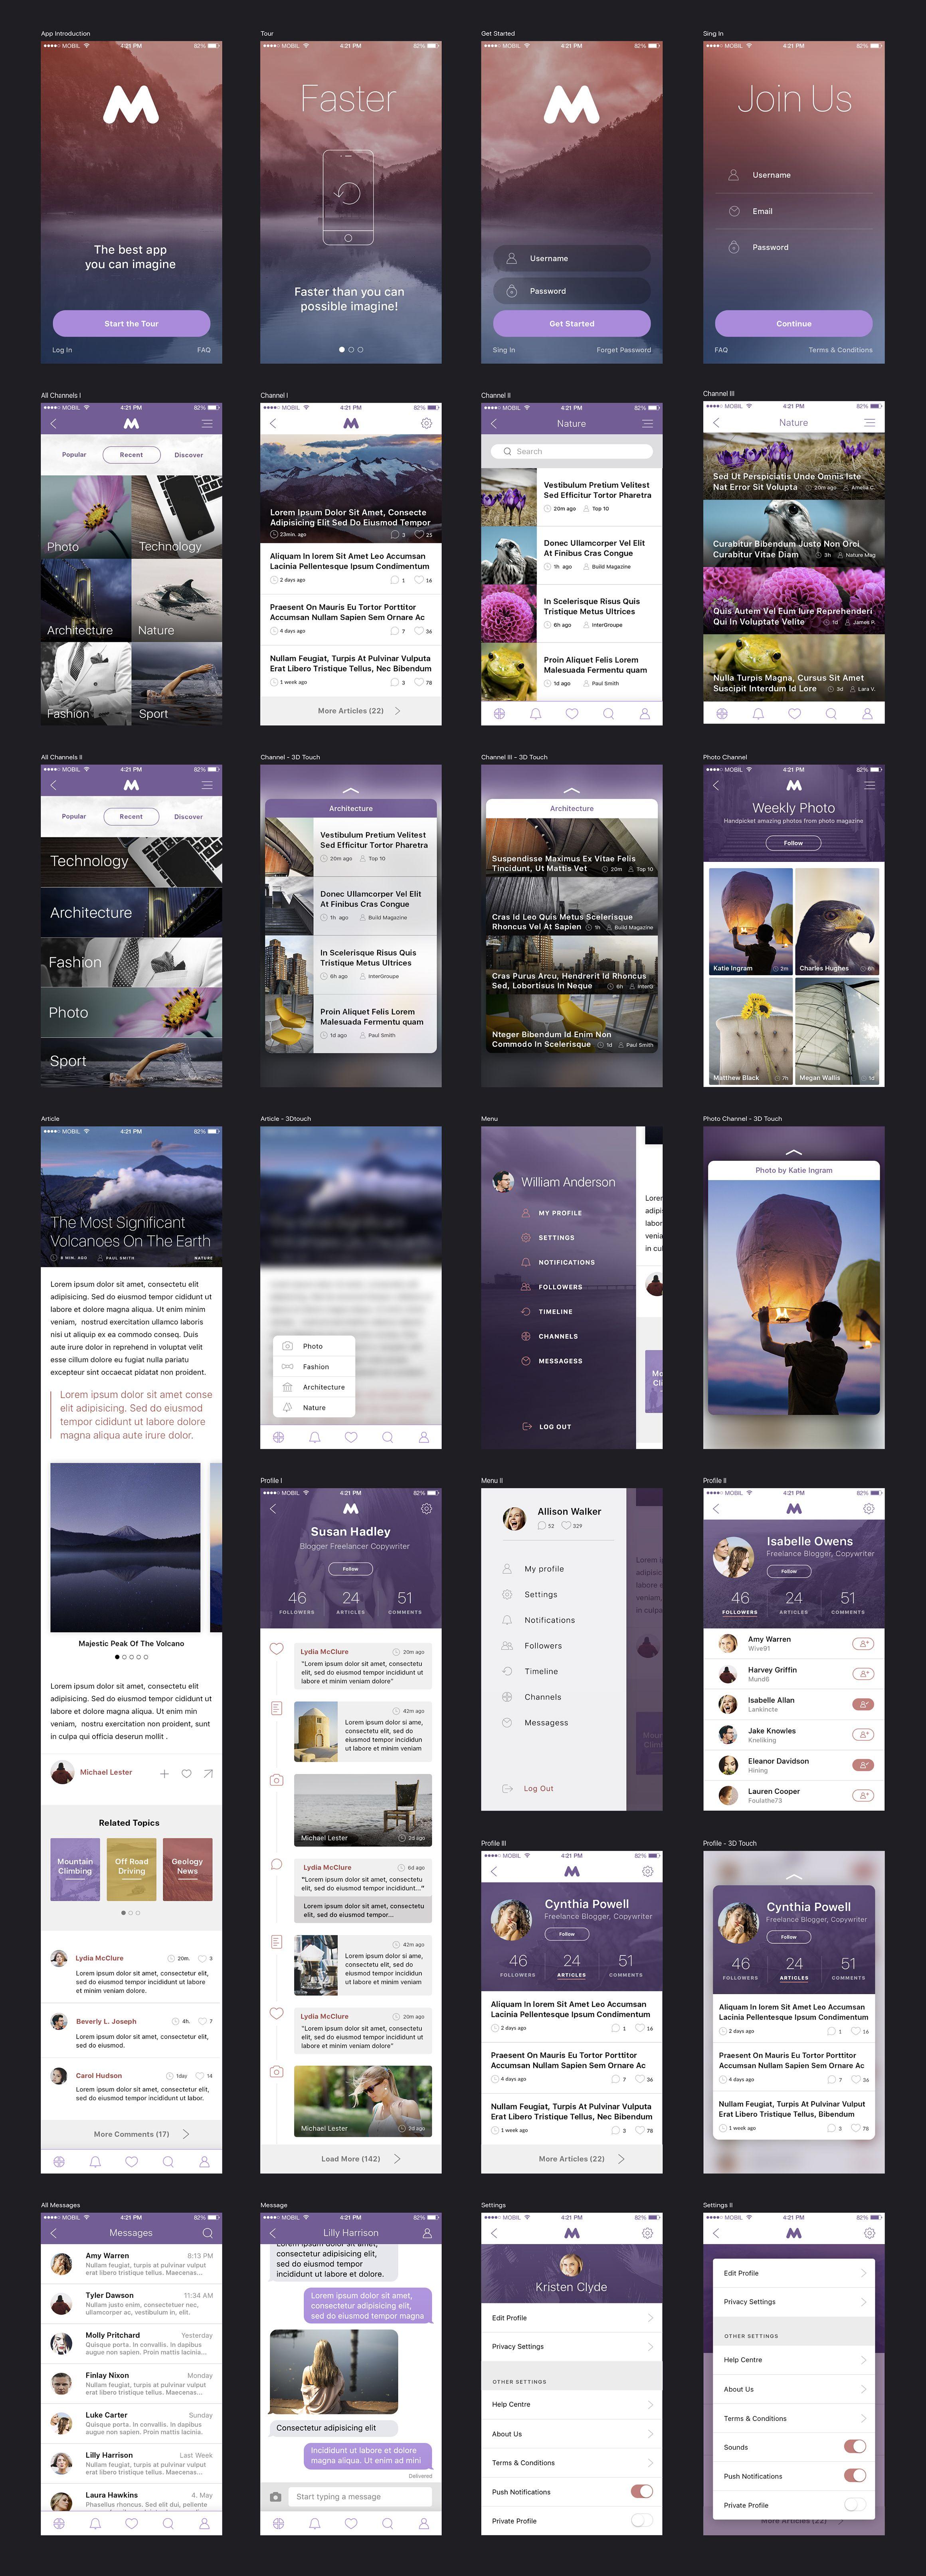 Megap - iOS Template | Ui kit, Design process and Template